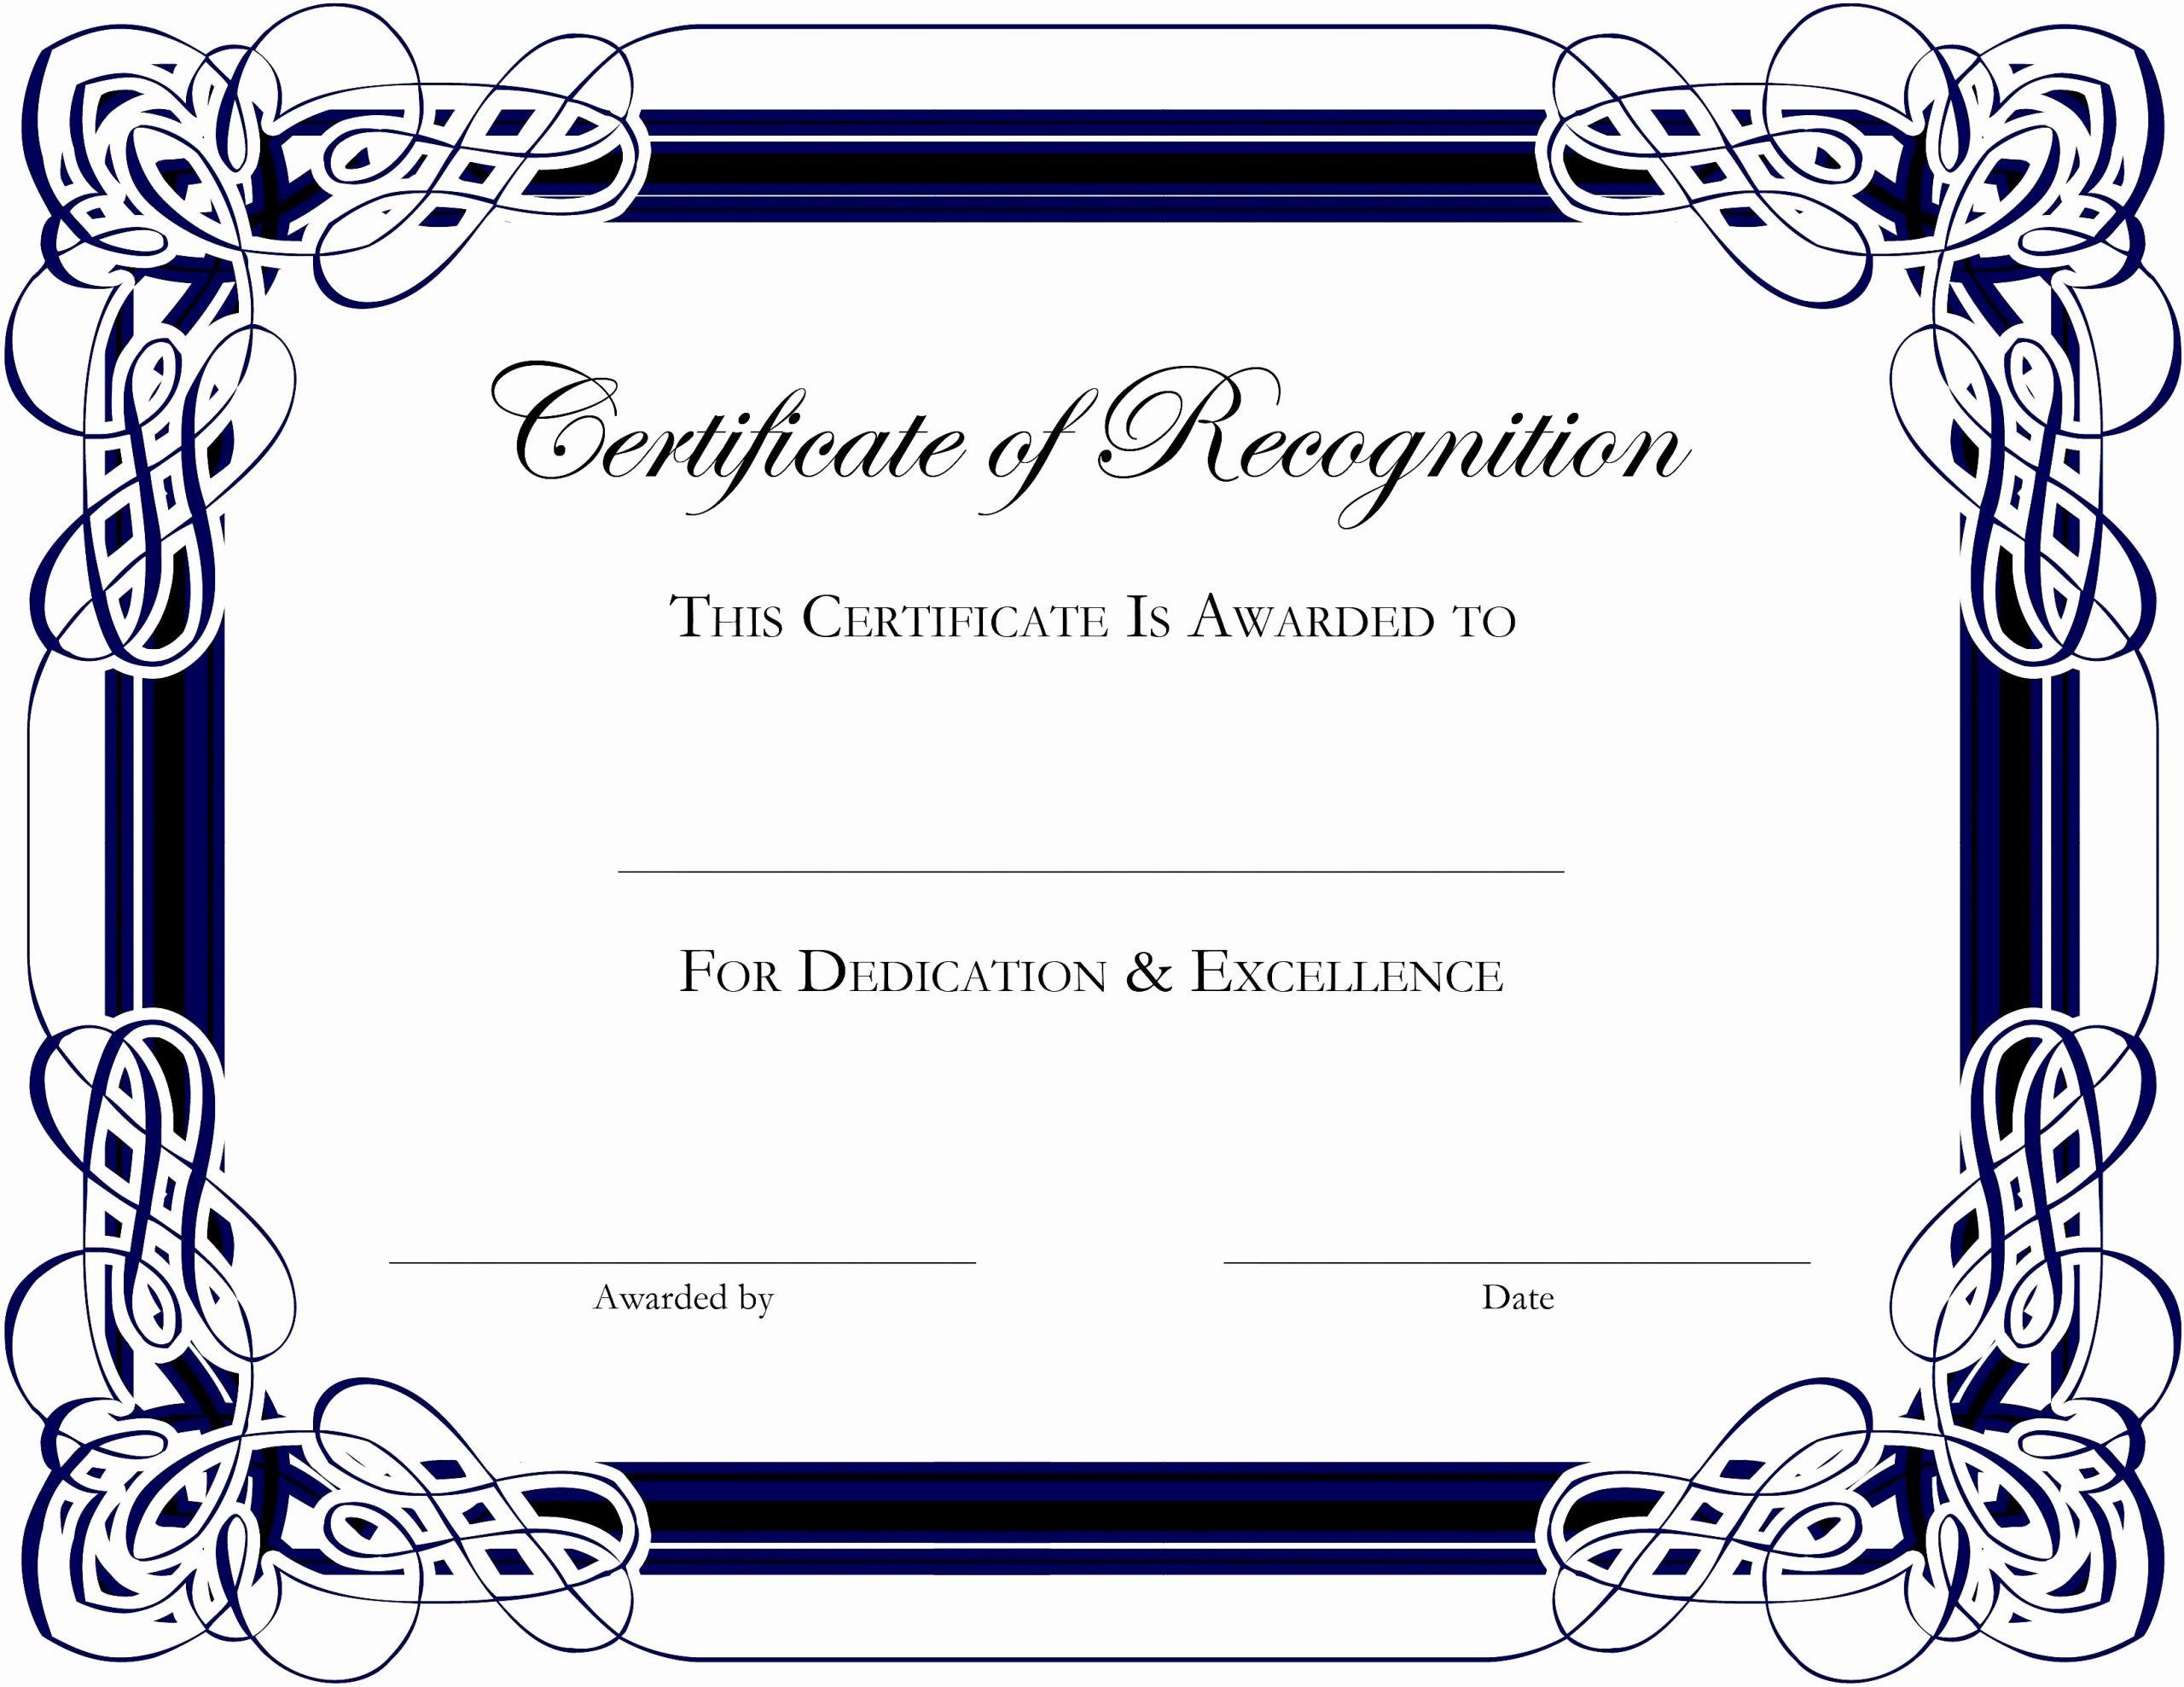 Microsoft Publisher Certificate Template Inspirational Certificate Template Free Publisher